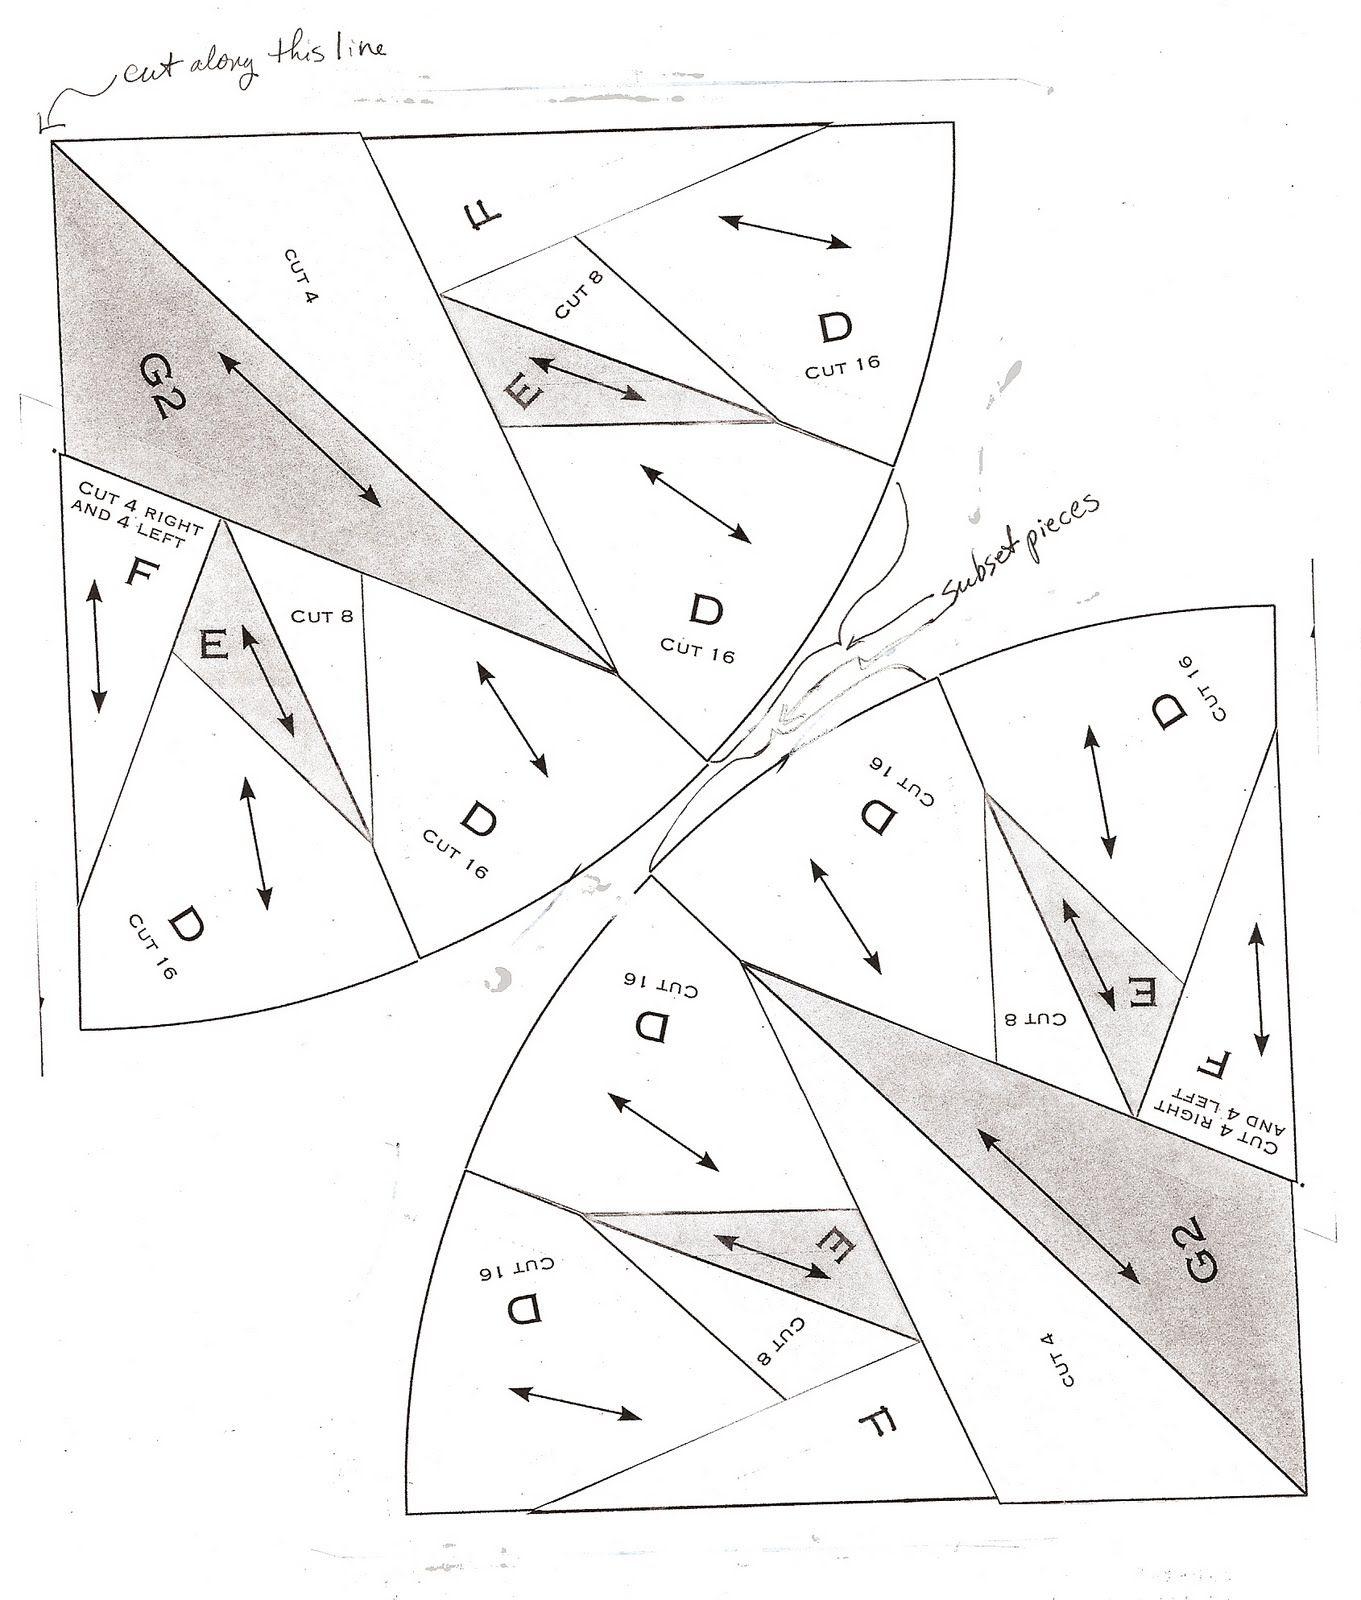 mariners compass quilt patterns | Mariner's Compass | Quilts ... : nautical star quilt pattern - Adamdwight.com